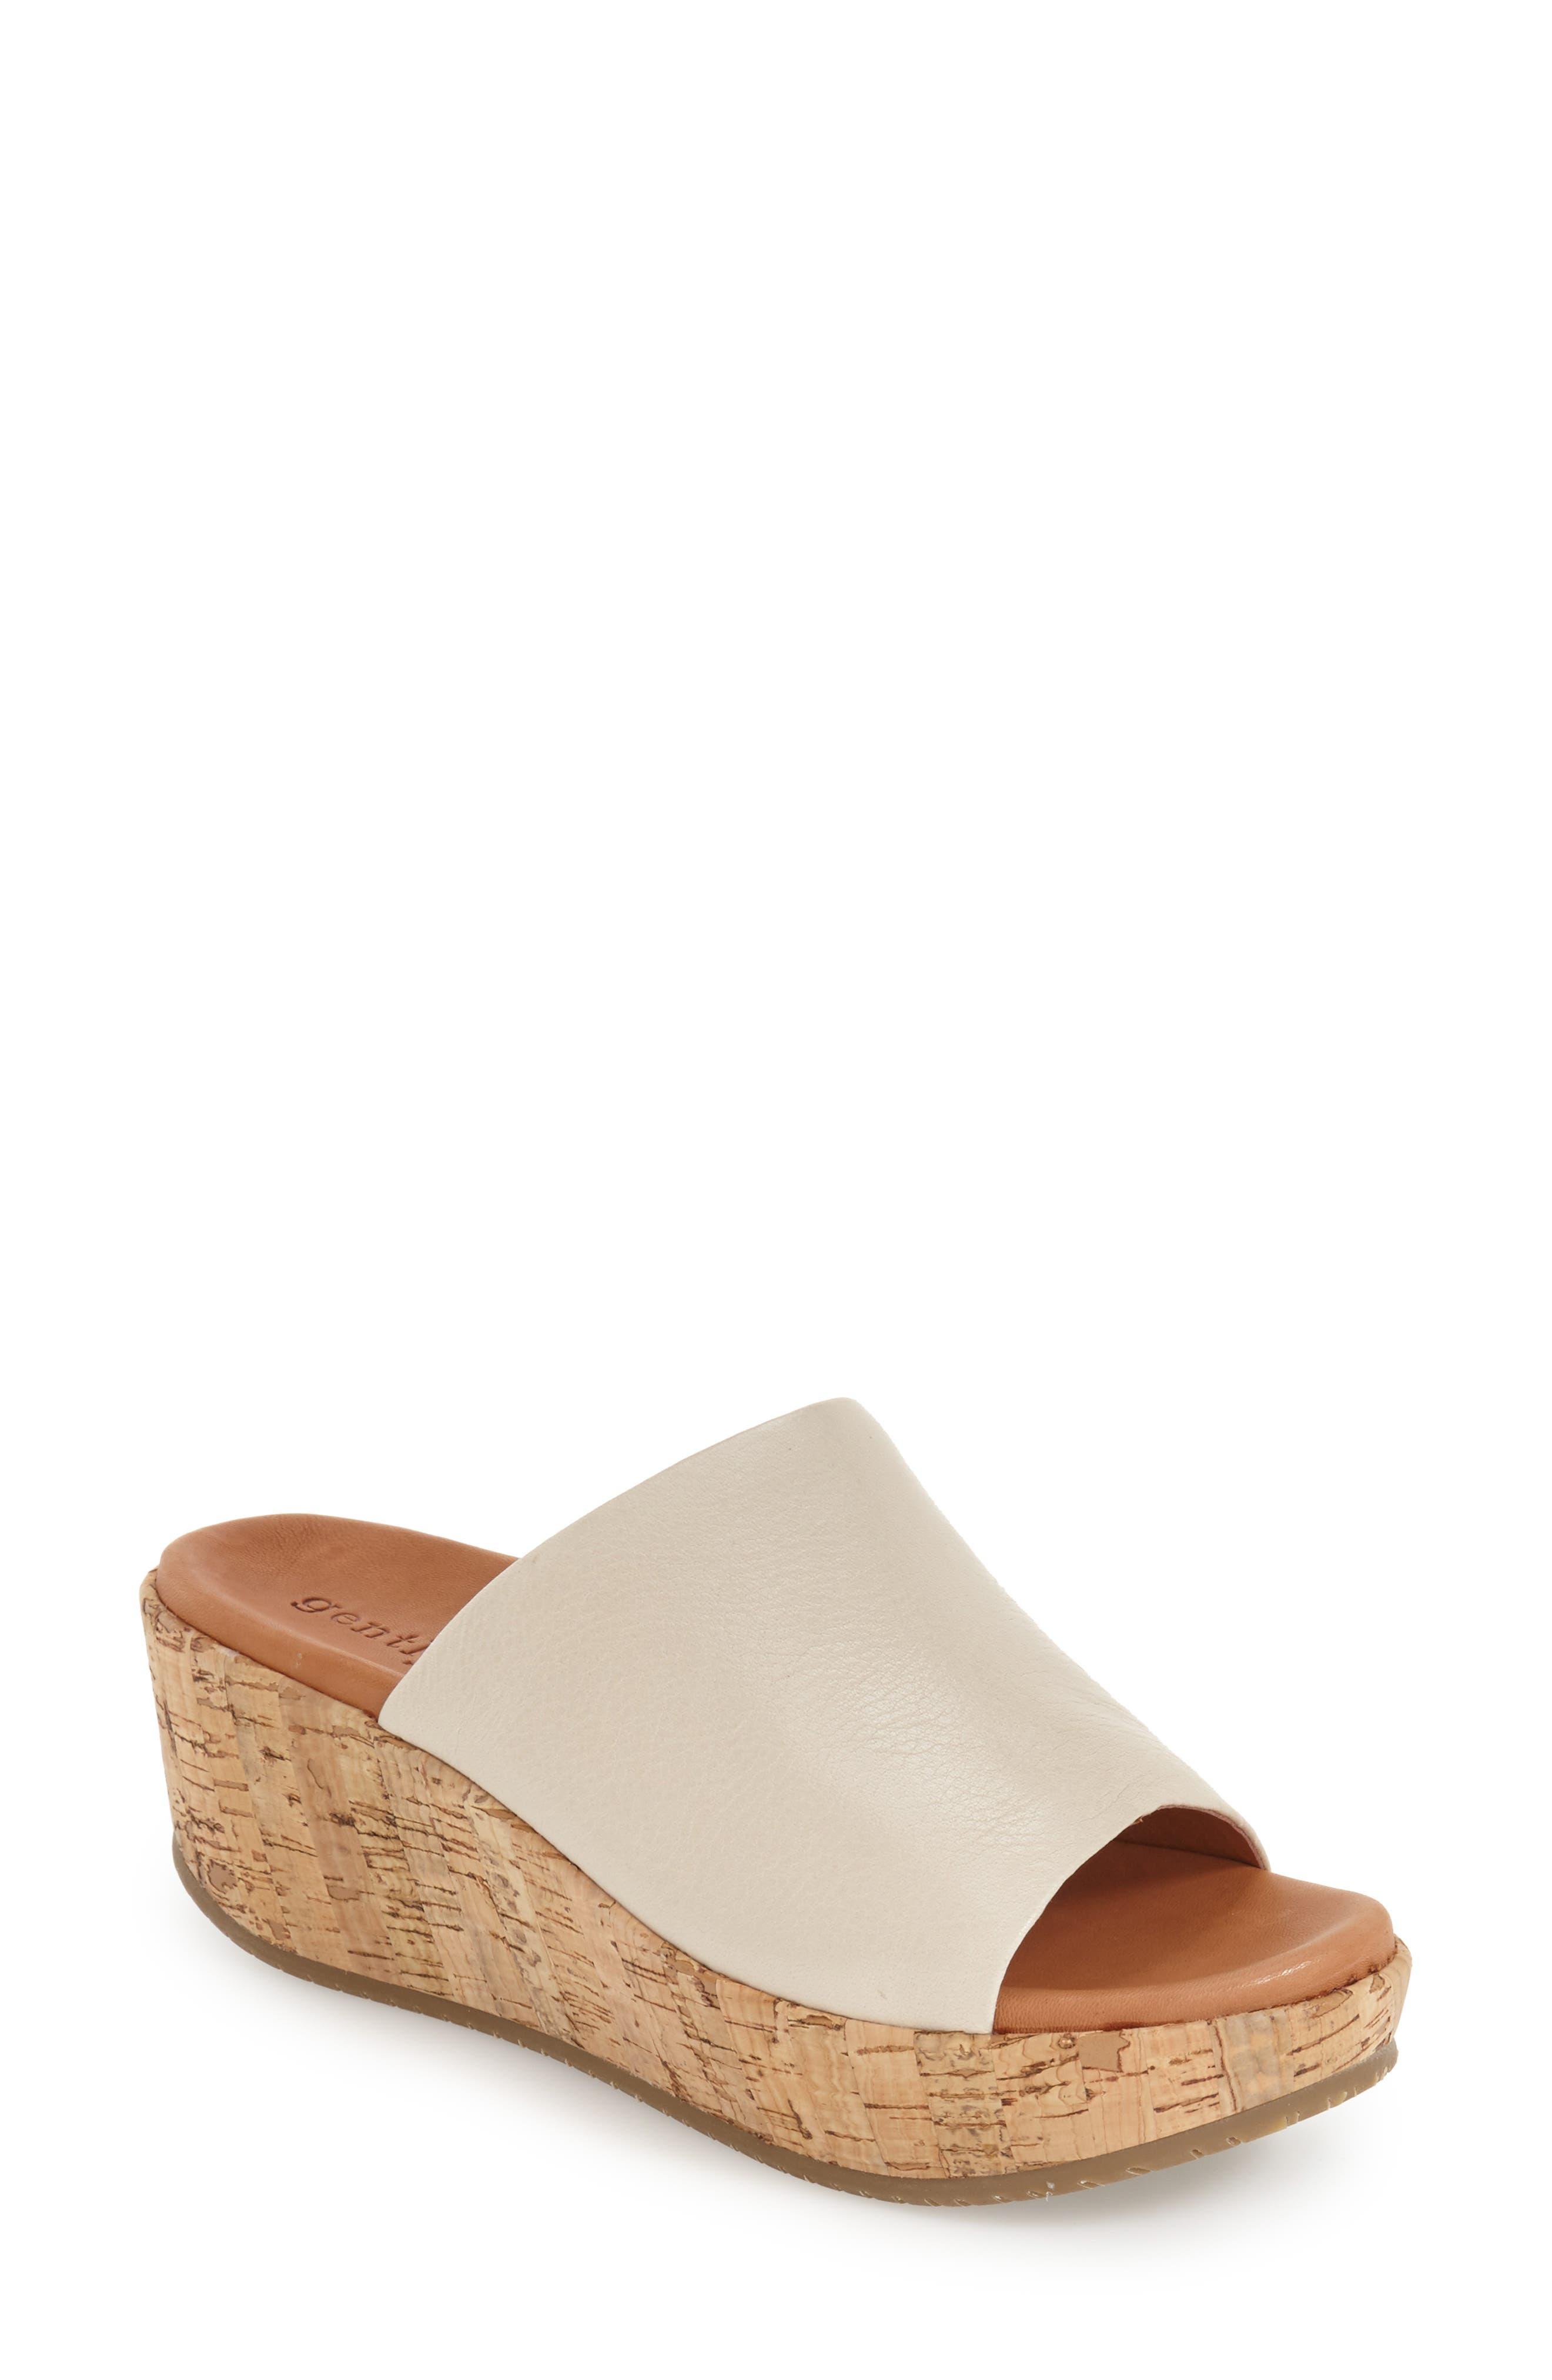 'Megan' Platform Wedge Sandal,                             Alternate thumbnail 4, color,                             053